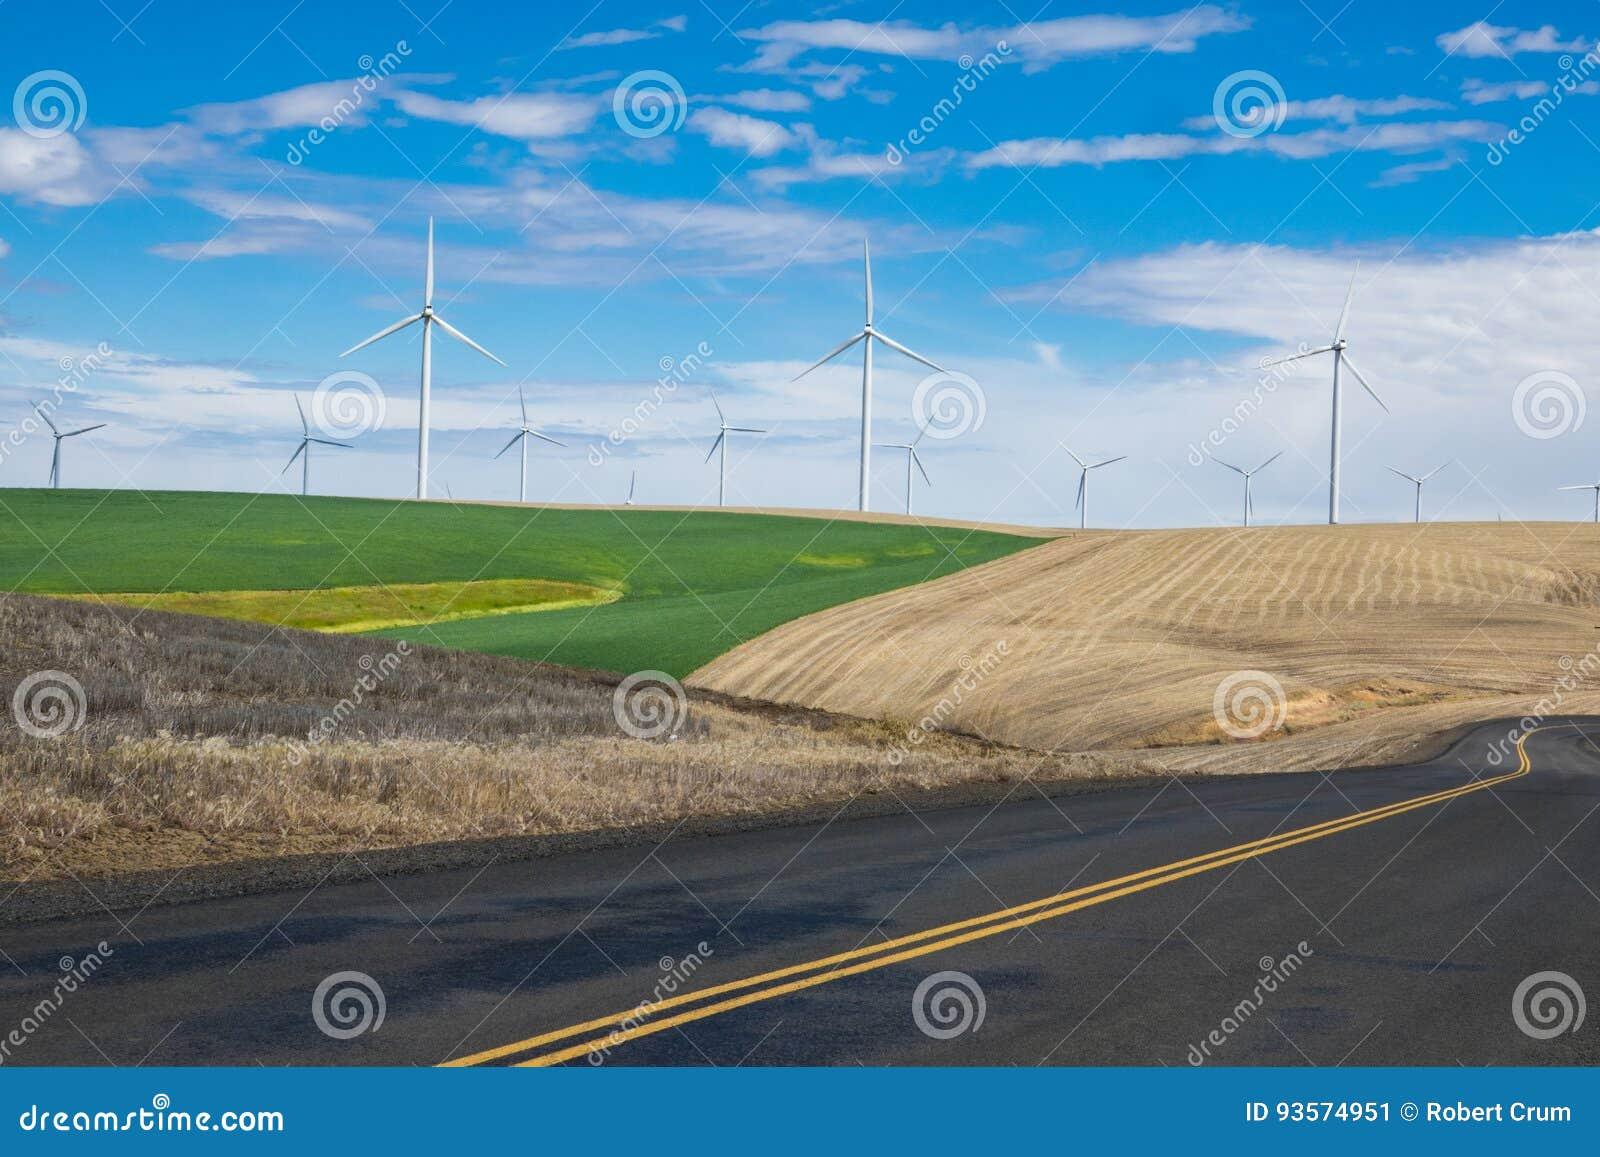 Wind turbines and wheat fields in Eastern Oregon